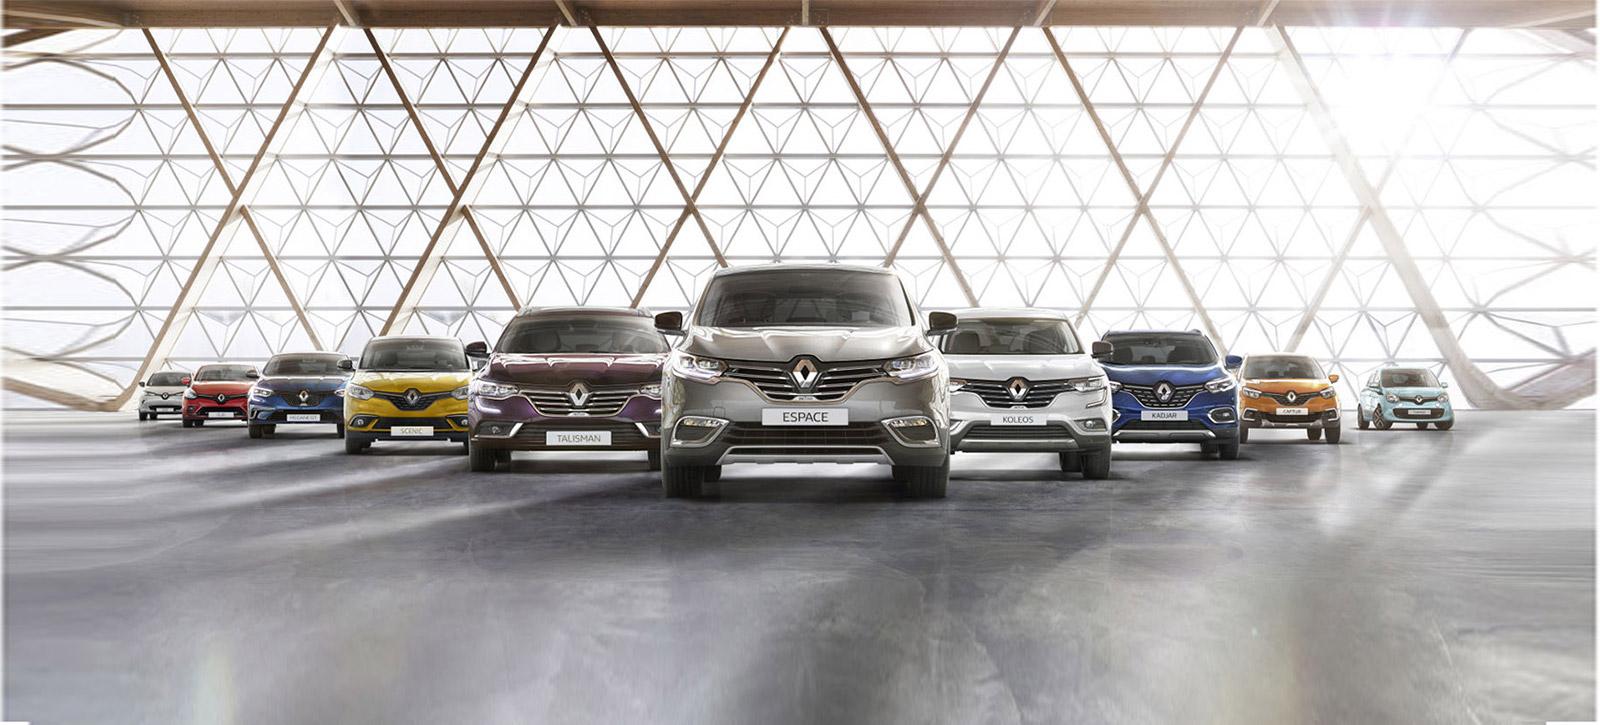 En Studio - Renault ZOE, Clio, Mégane GT, Scenic, Talisman, Espace, Koleos, Kadjar, Captur, Twingo